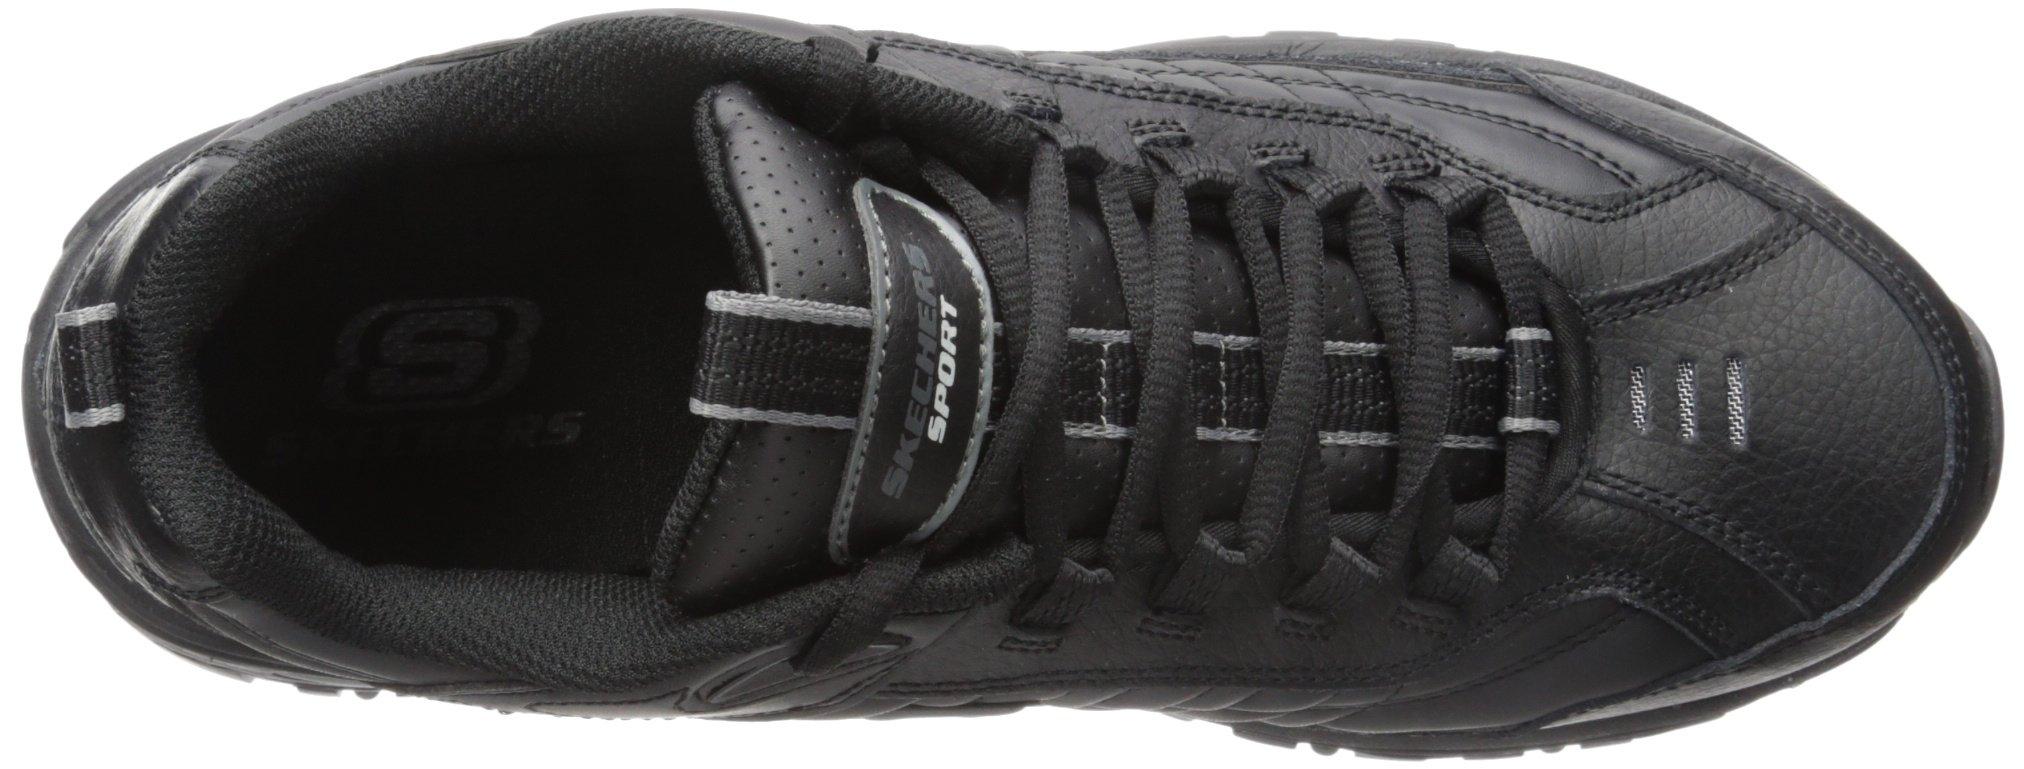 Skechers Sport Men's Energy Afterburn Lace-Up Sneaker,Black,13 M by Skechers (Image #8)